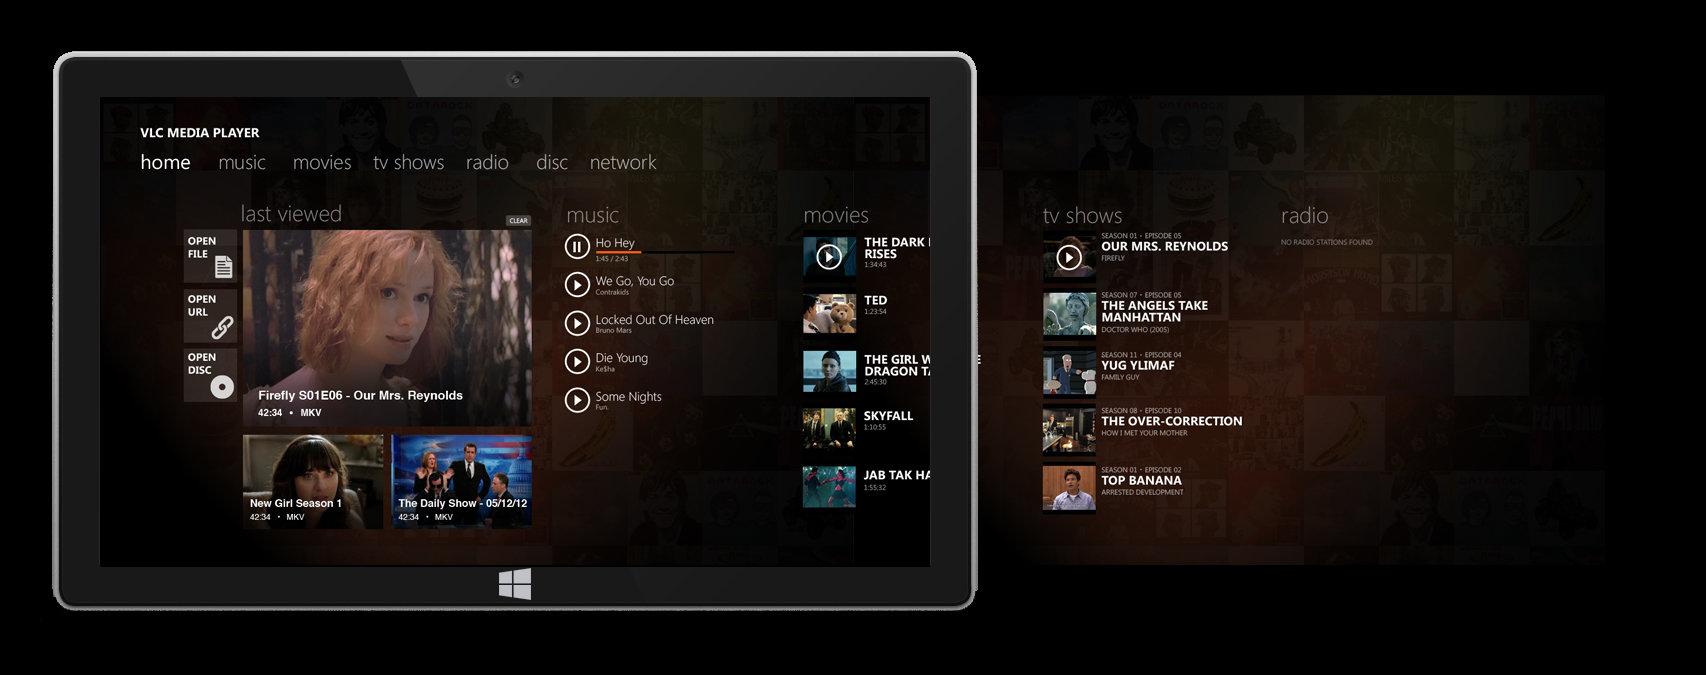 VLC Media Player mit angepasster Oberfläche